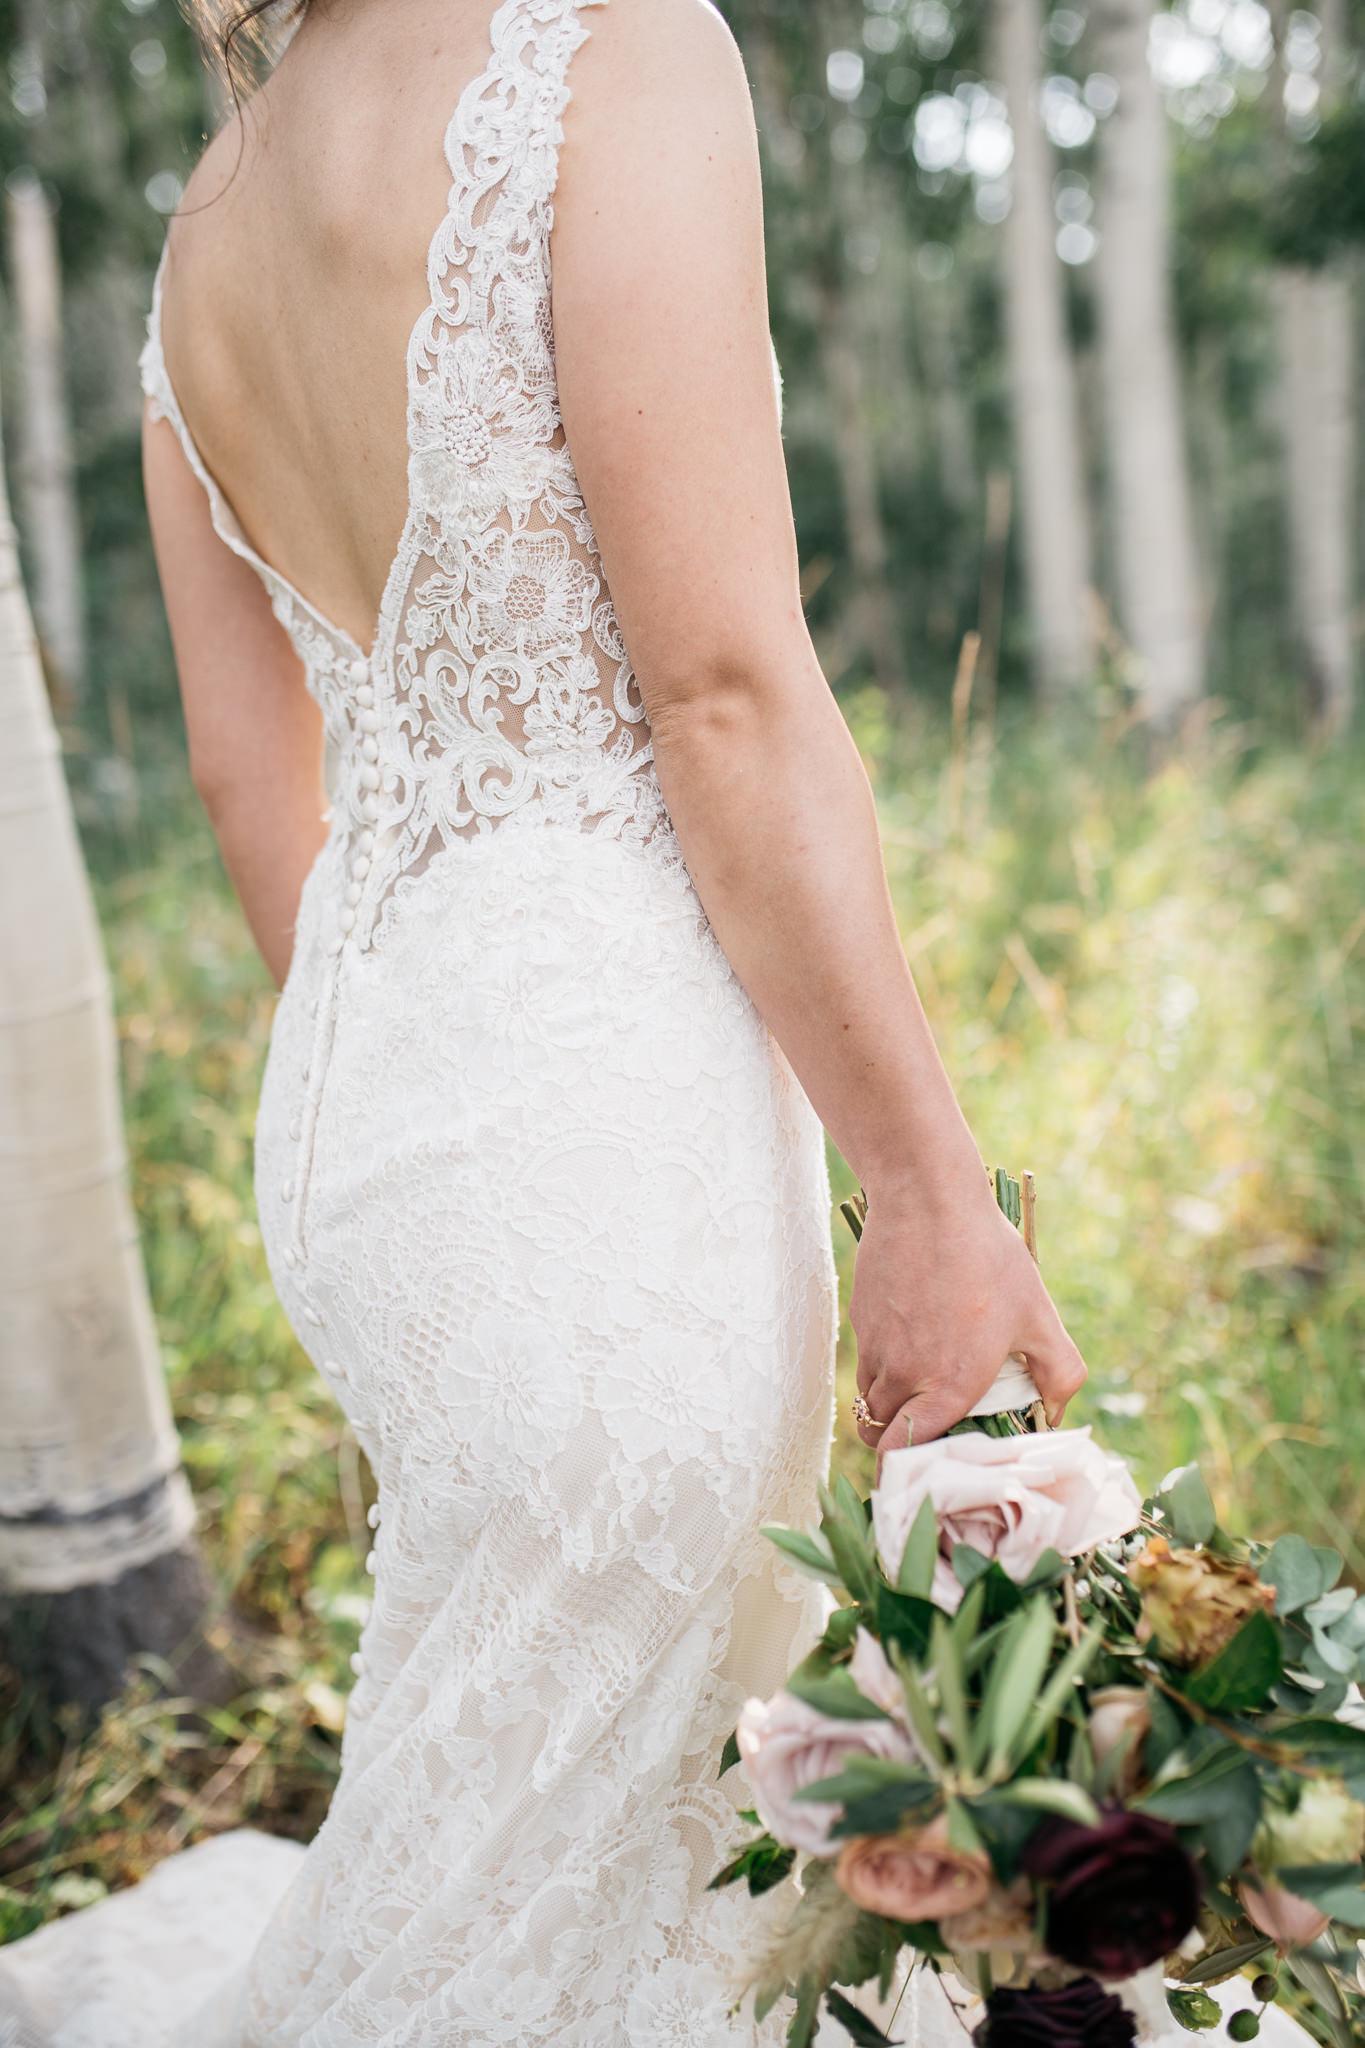 405_ONL_Kat_Nick_Wedding_Trevor_Hooper_Photo.jpg